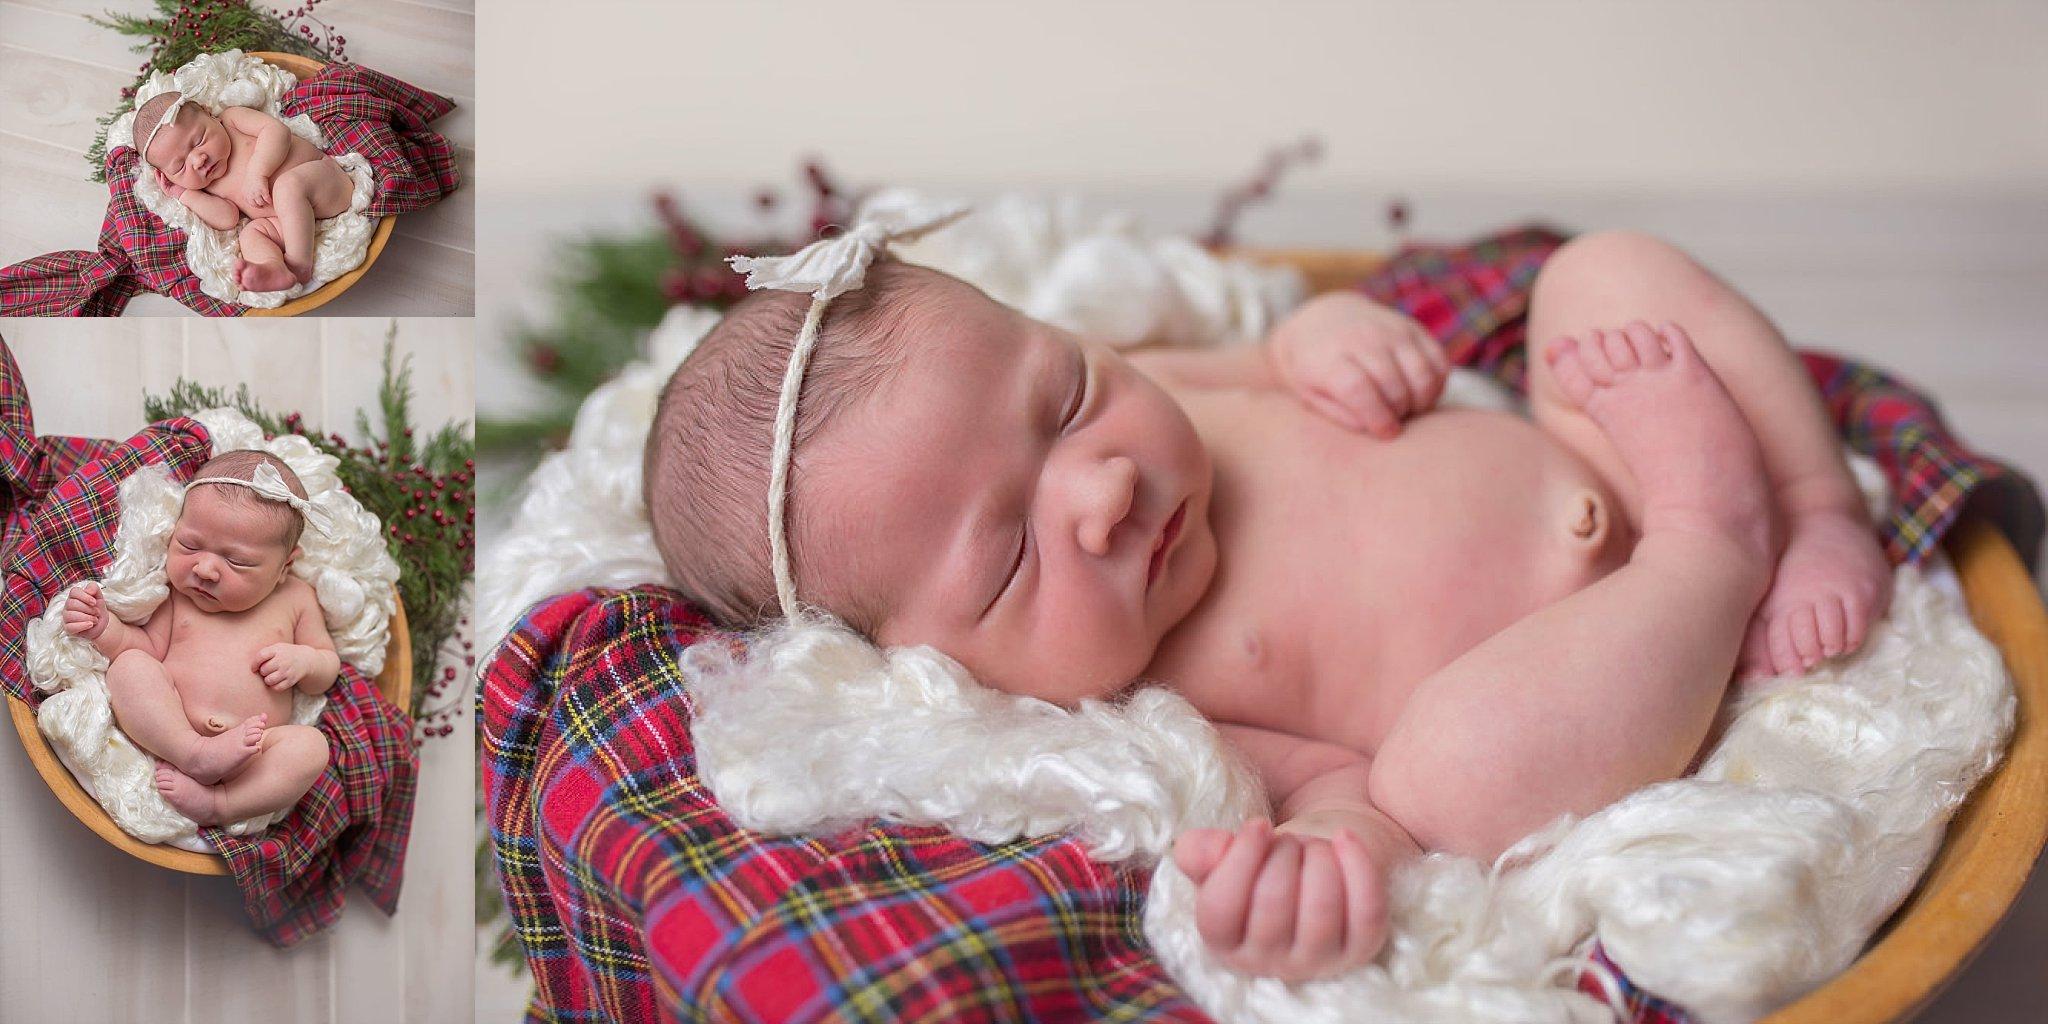 Durham NC newborn photographer Candace Wolfenbarger photographs Christmas baby in bowl.